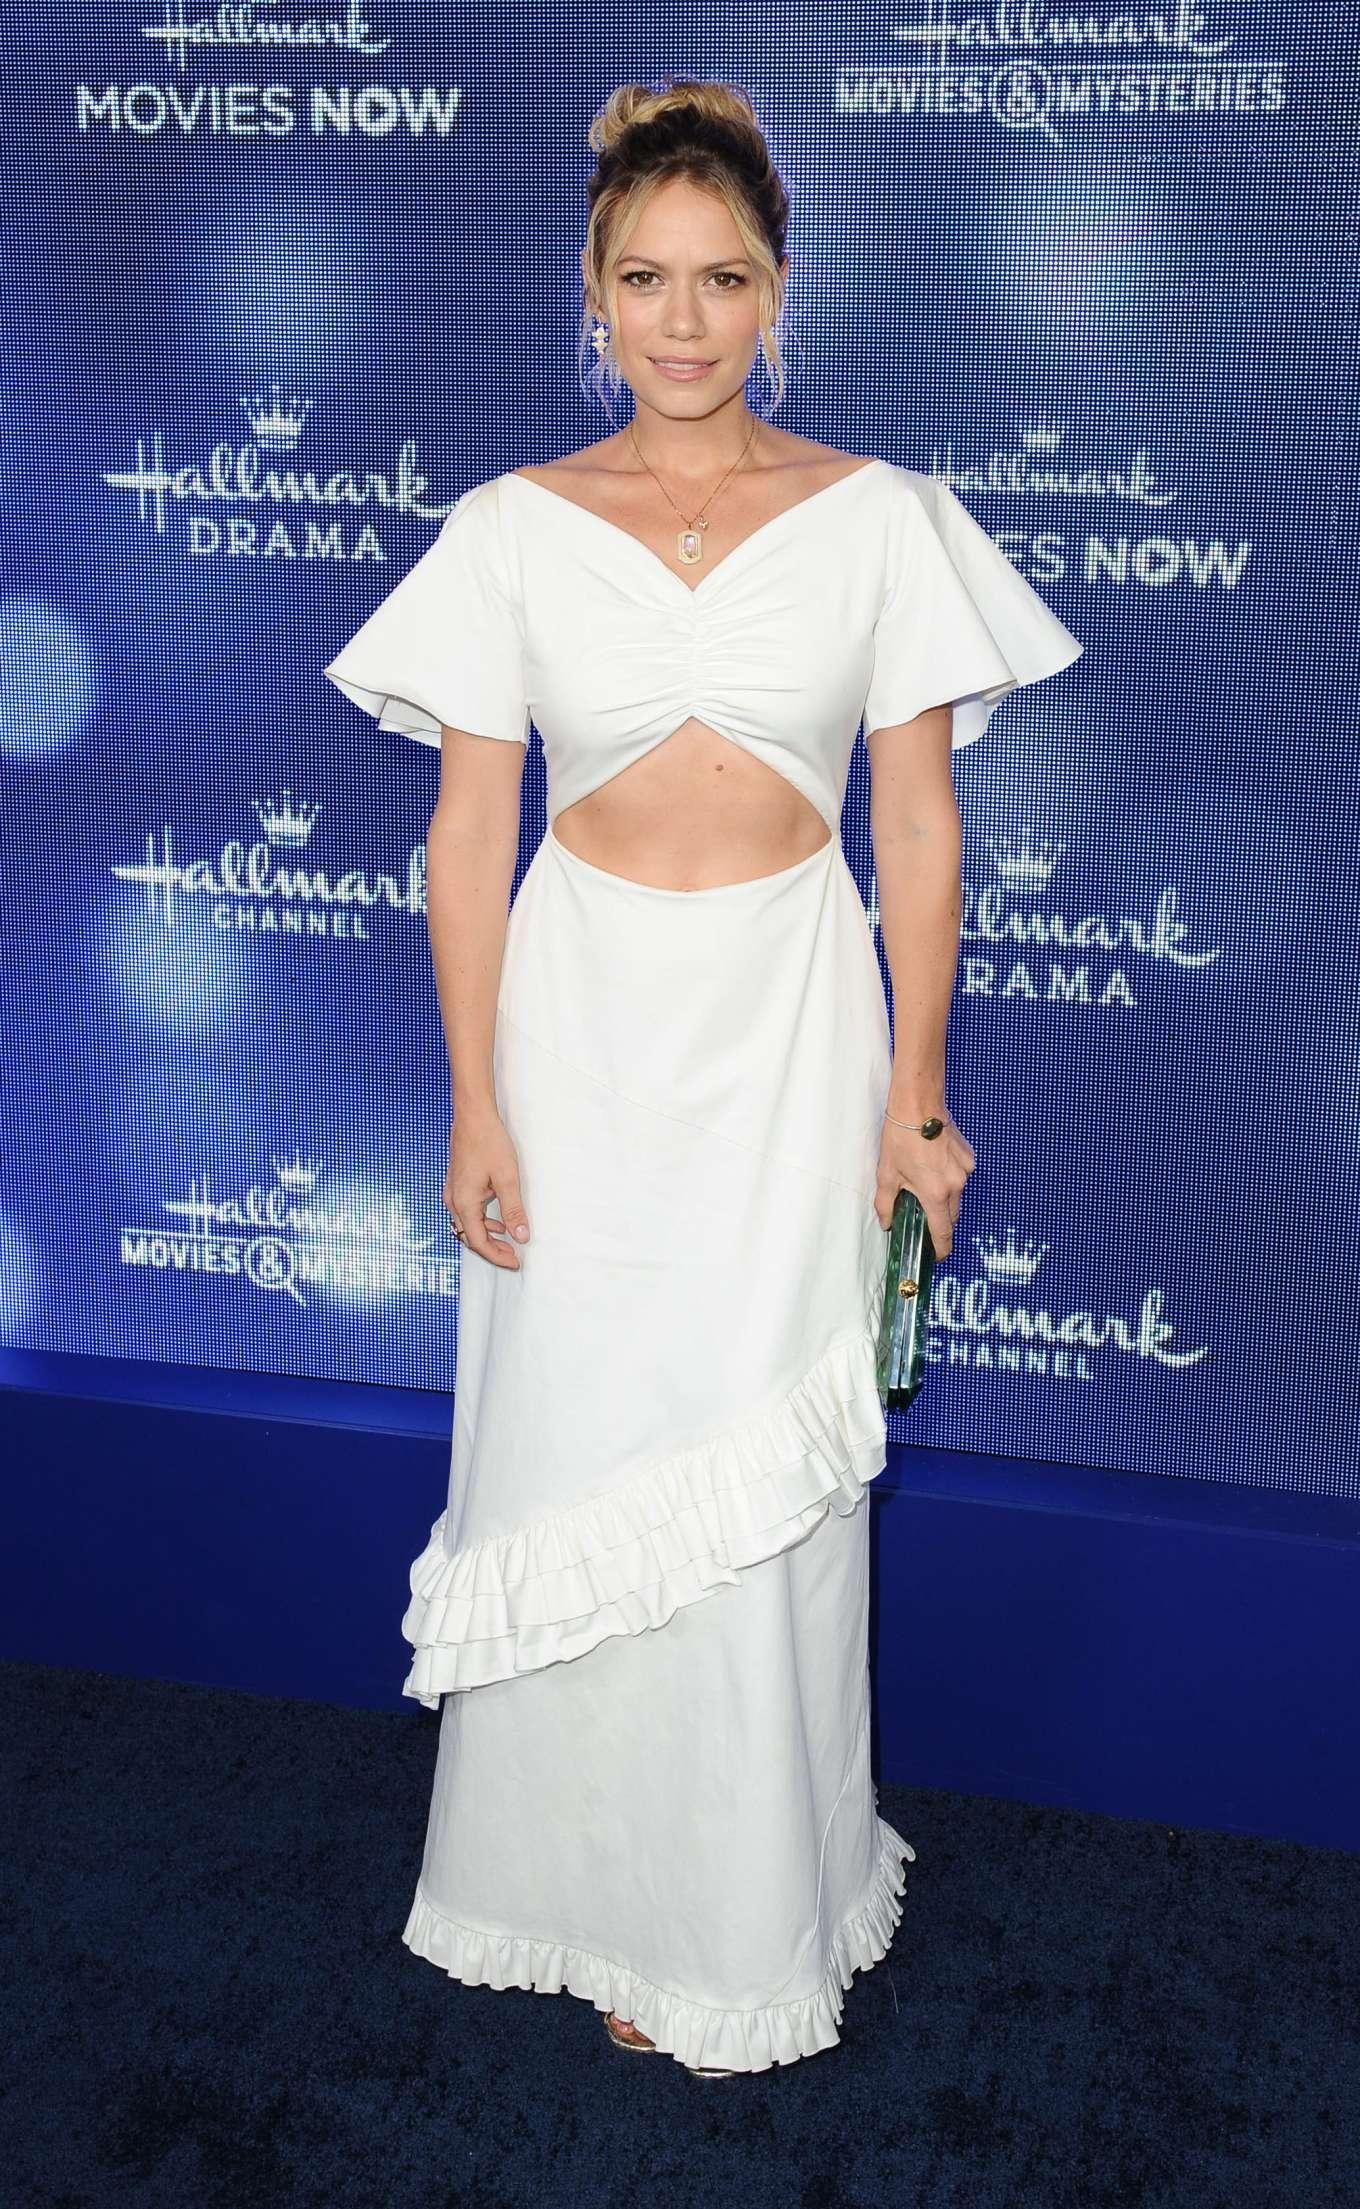 Bethany Joy Lenz 2019 : Bethany Joy Lenz – Hallmark Channel Summer 2019 TCA Event-11